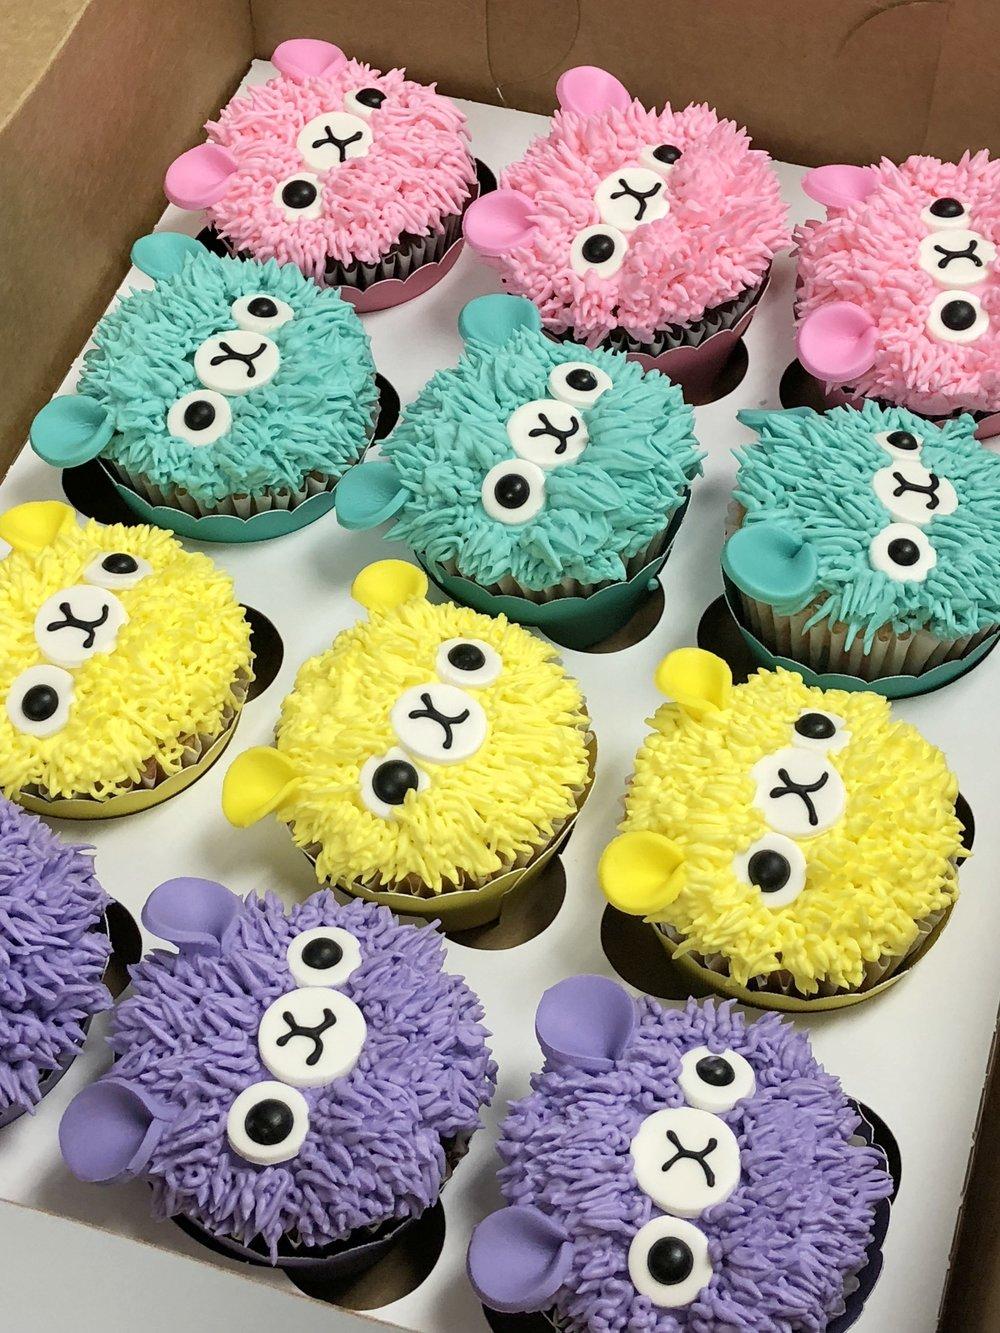 Buttercream cupcakes